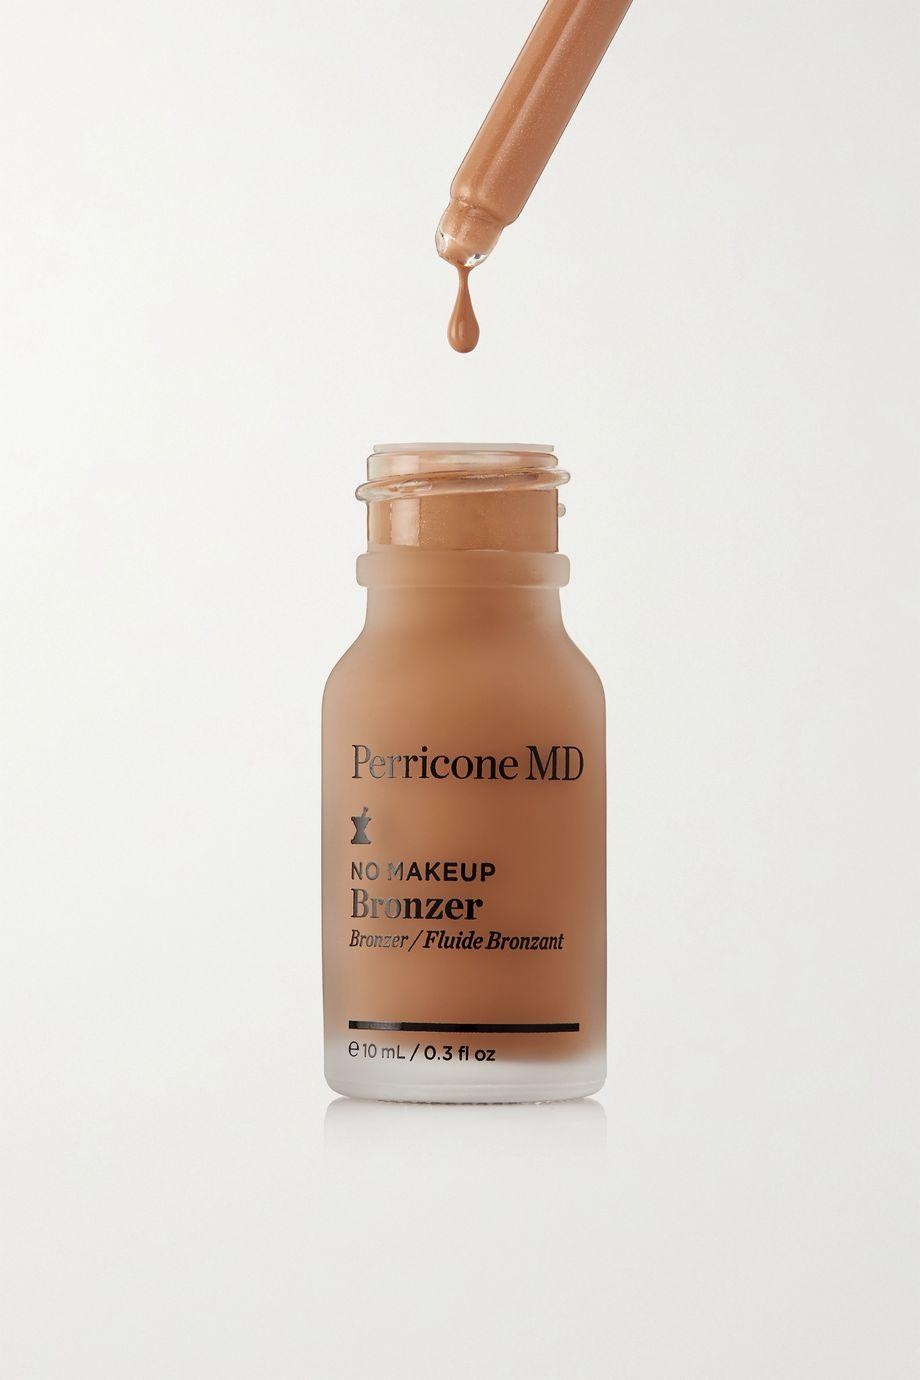 Perricone MD No Makeup Bronzer Broad Spectrum SPF15, 10ml